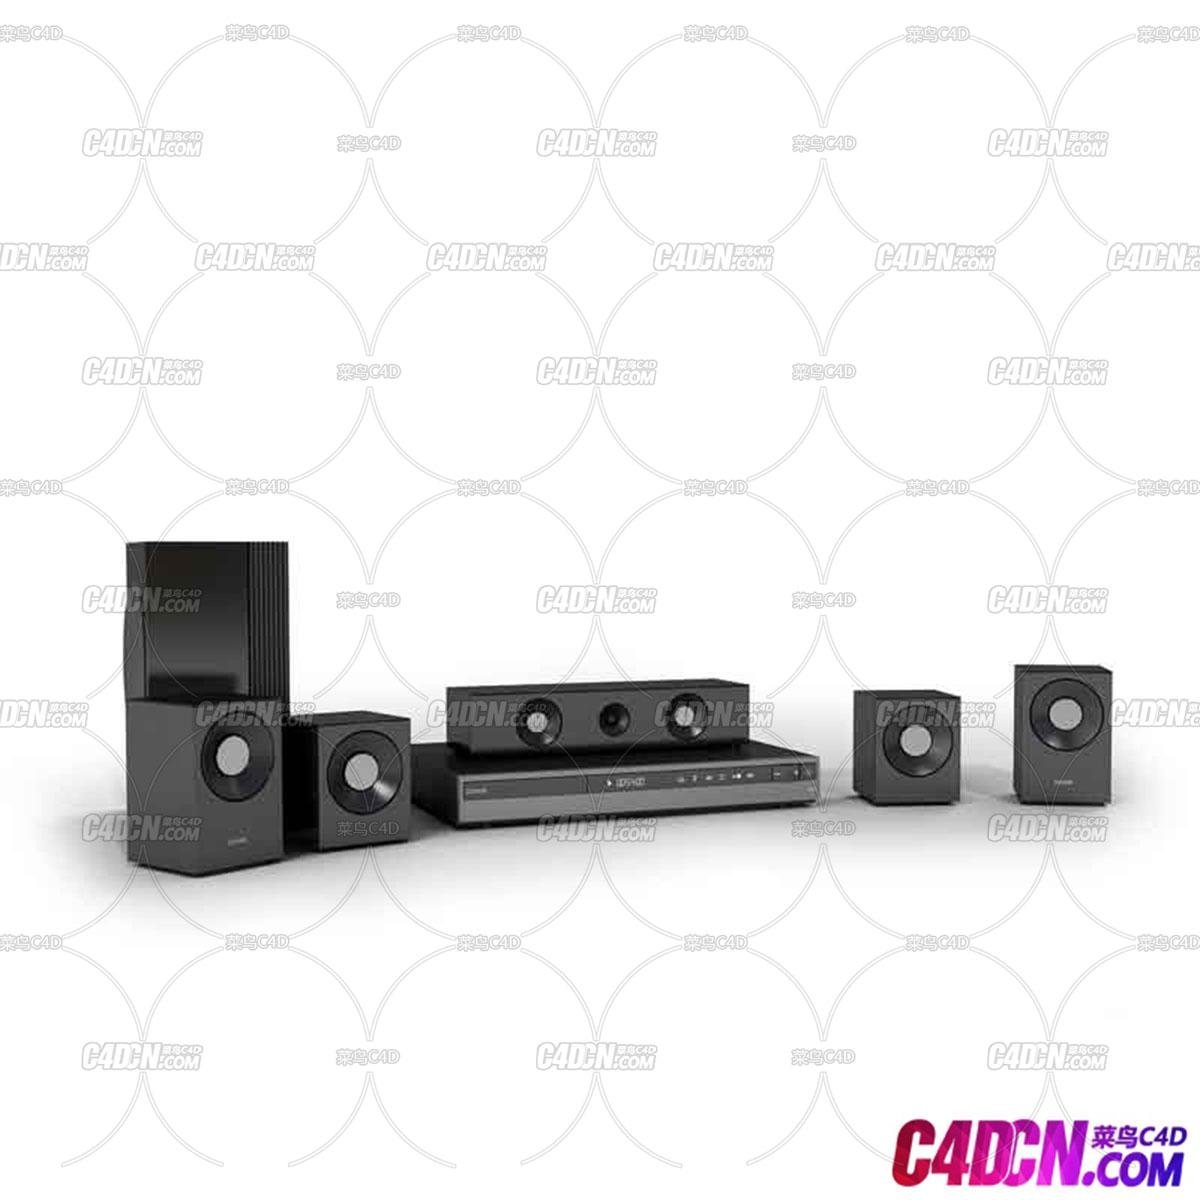 C4D模型 家庭影院播放器音响音箱设备喇叭影碟机DVD模型